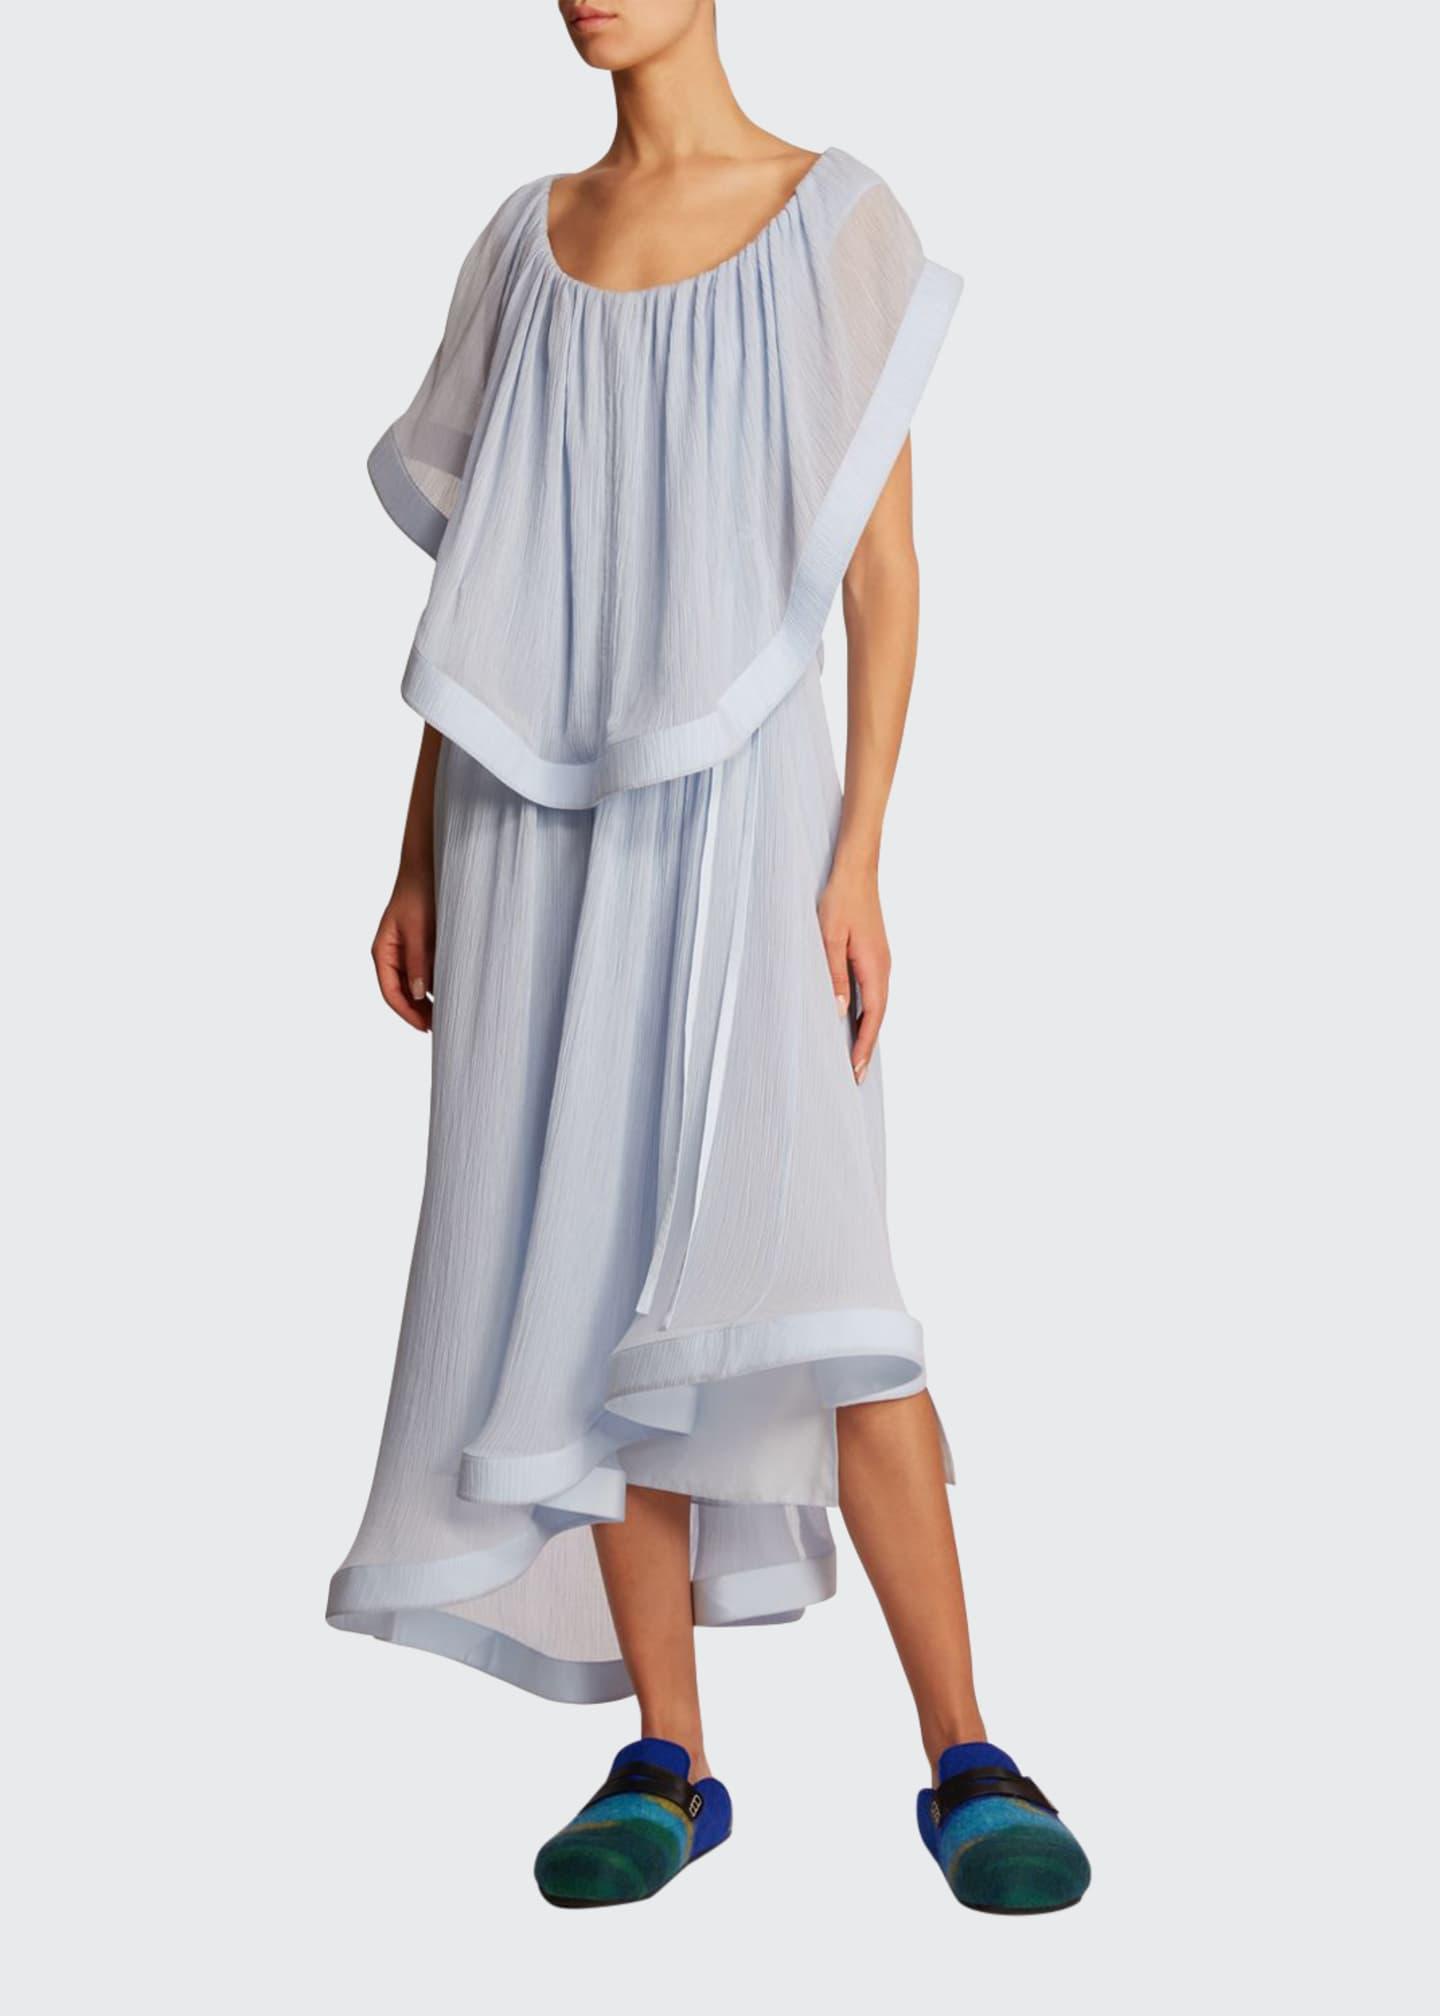 JW Anderson Silk Overylay Asymmetric Dress